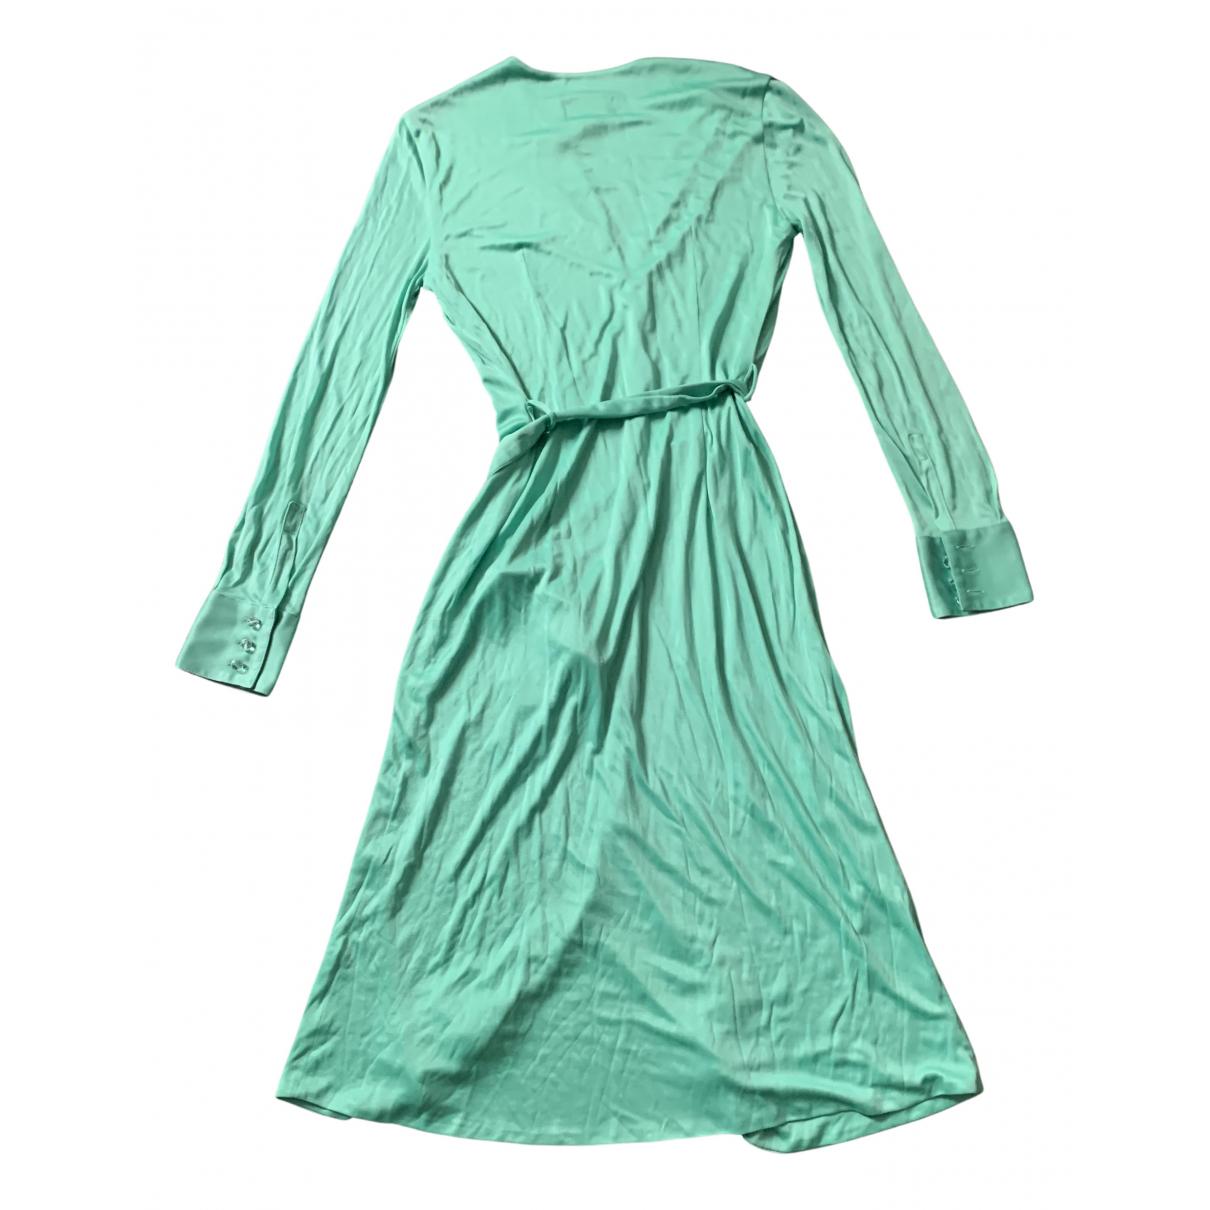 Gianni Versace \N Kleid in  Gruen Polyester